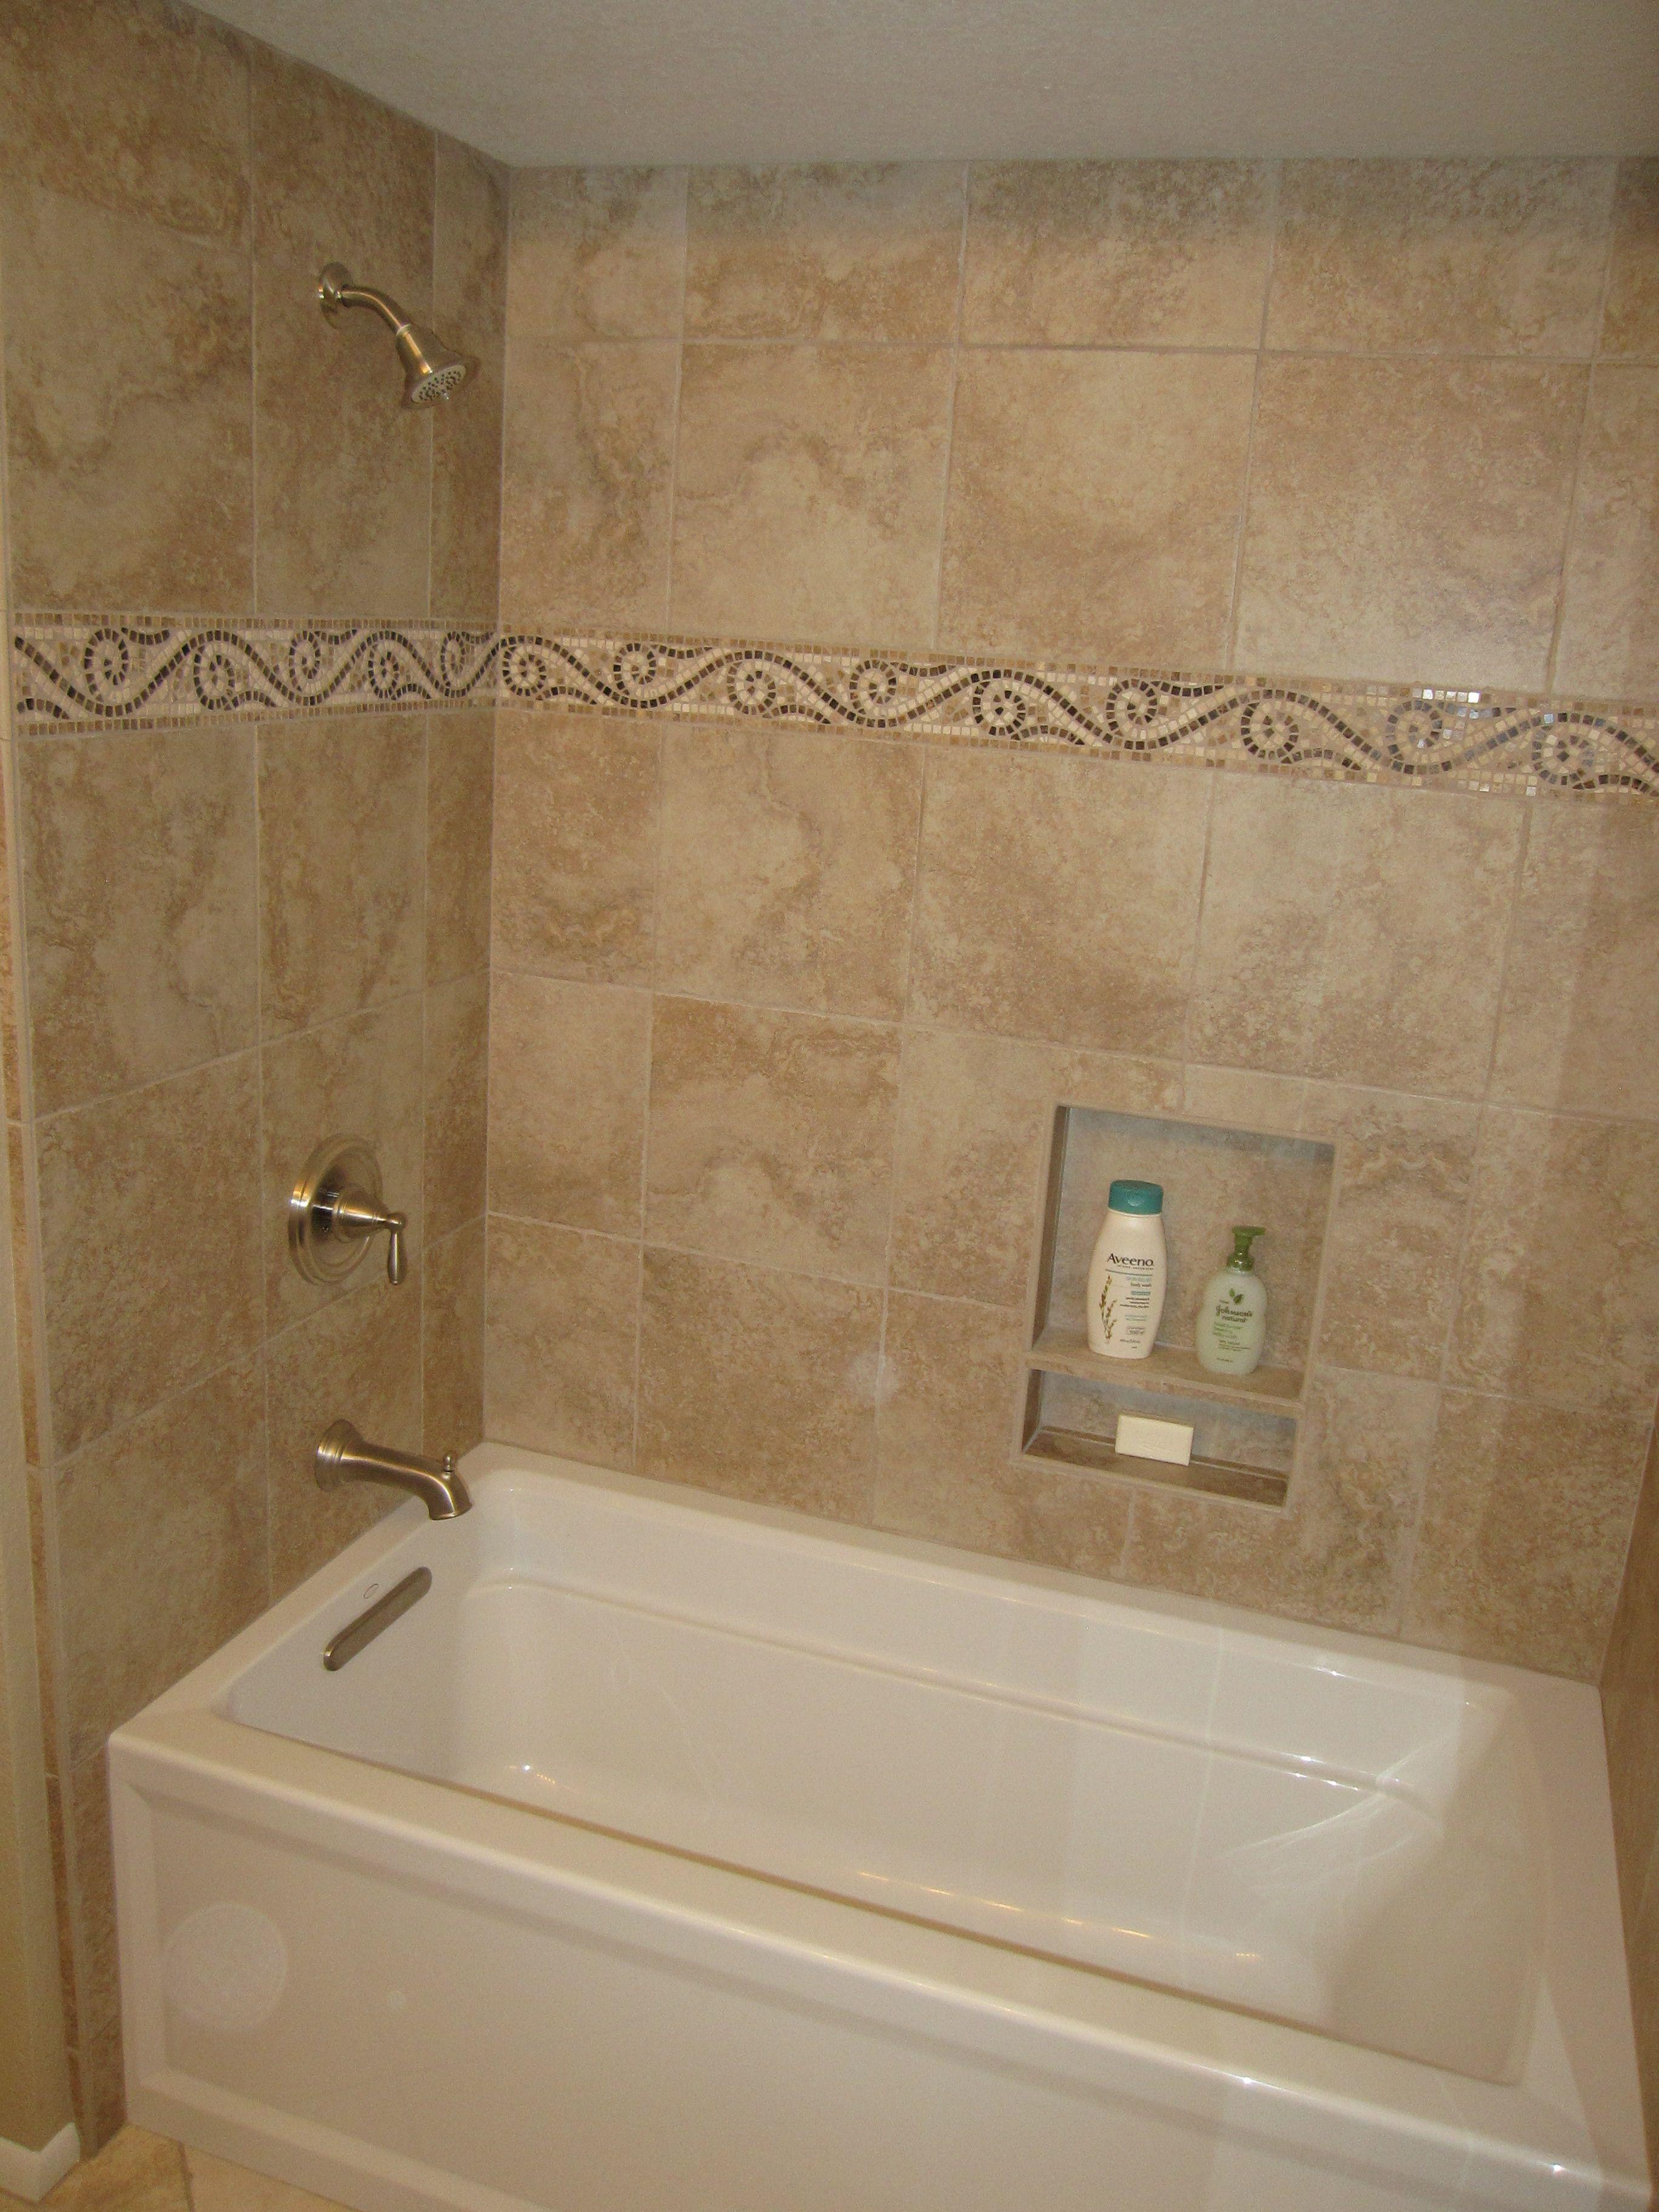 Hall Bath Acrylic Soaking Tub With Tile Shower Surround